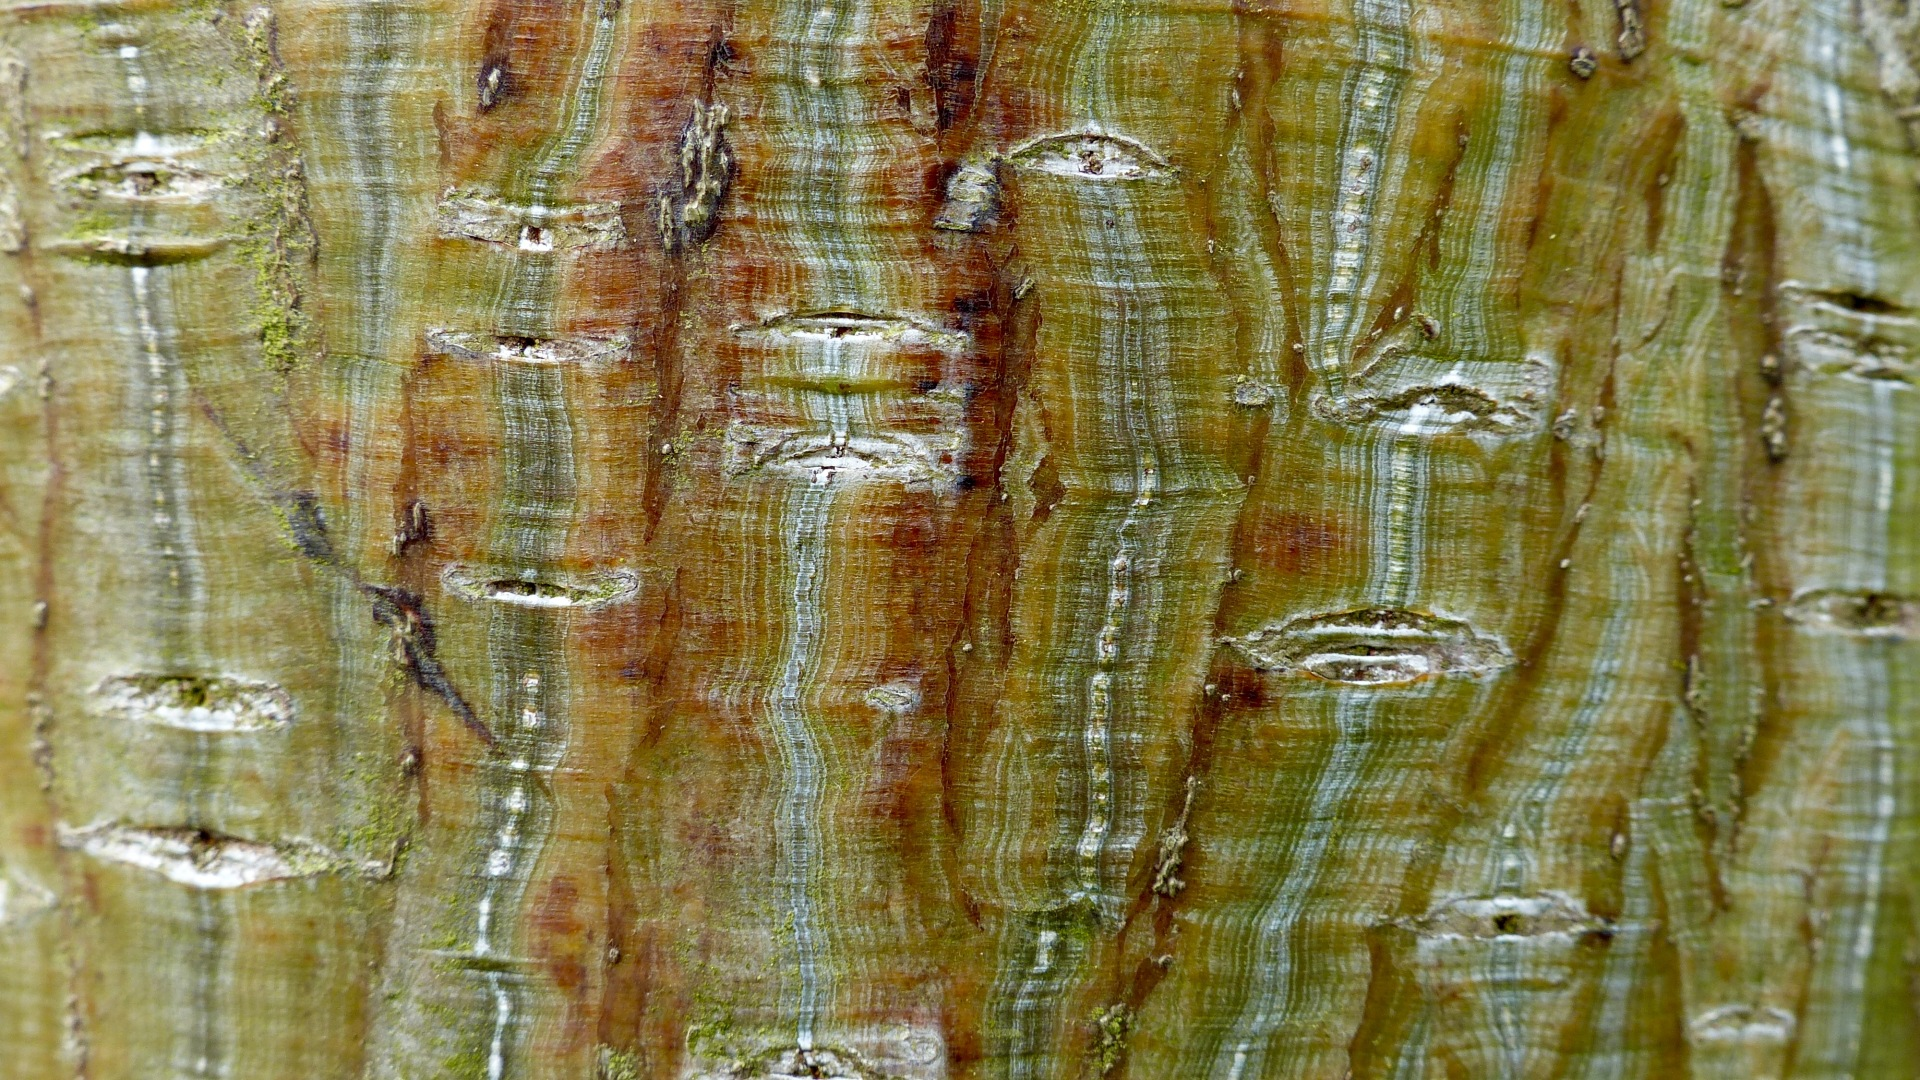 Natural tree bark pattern